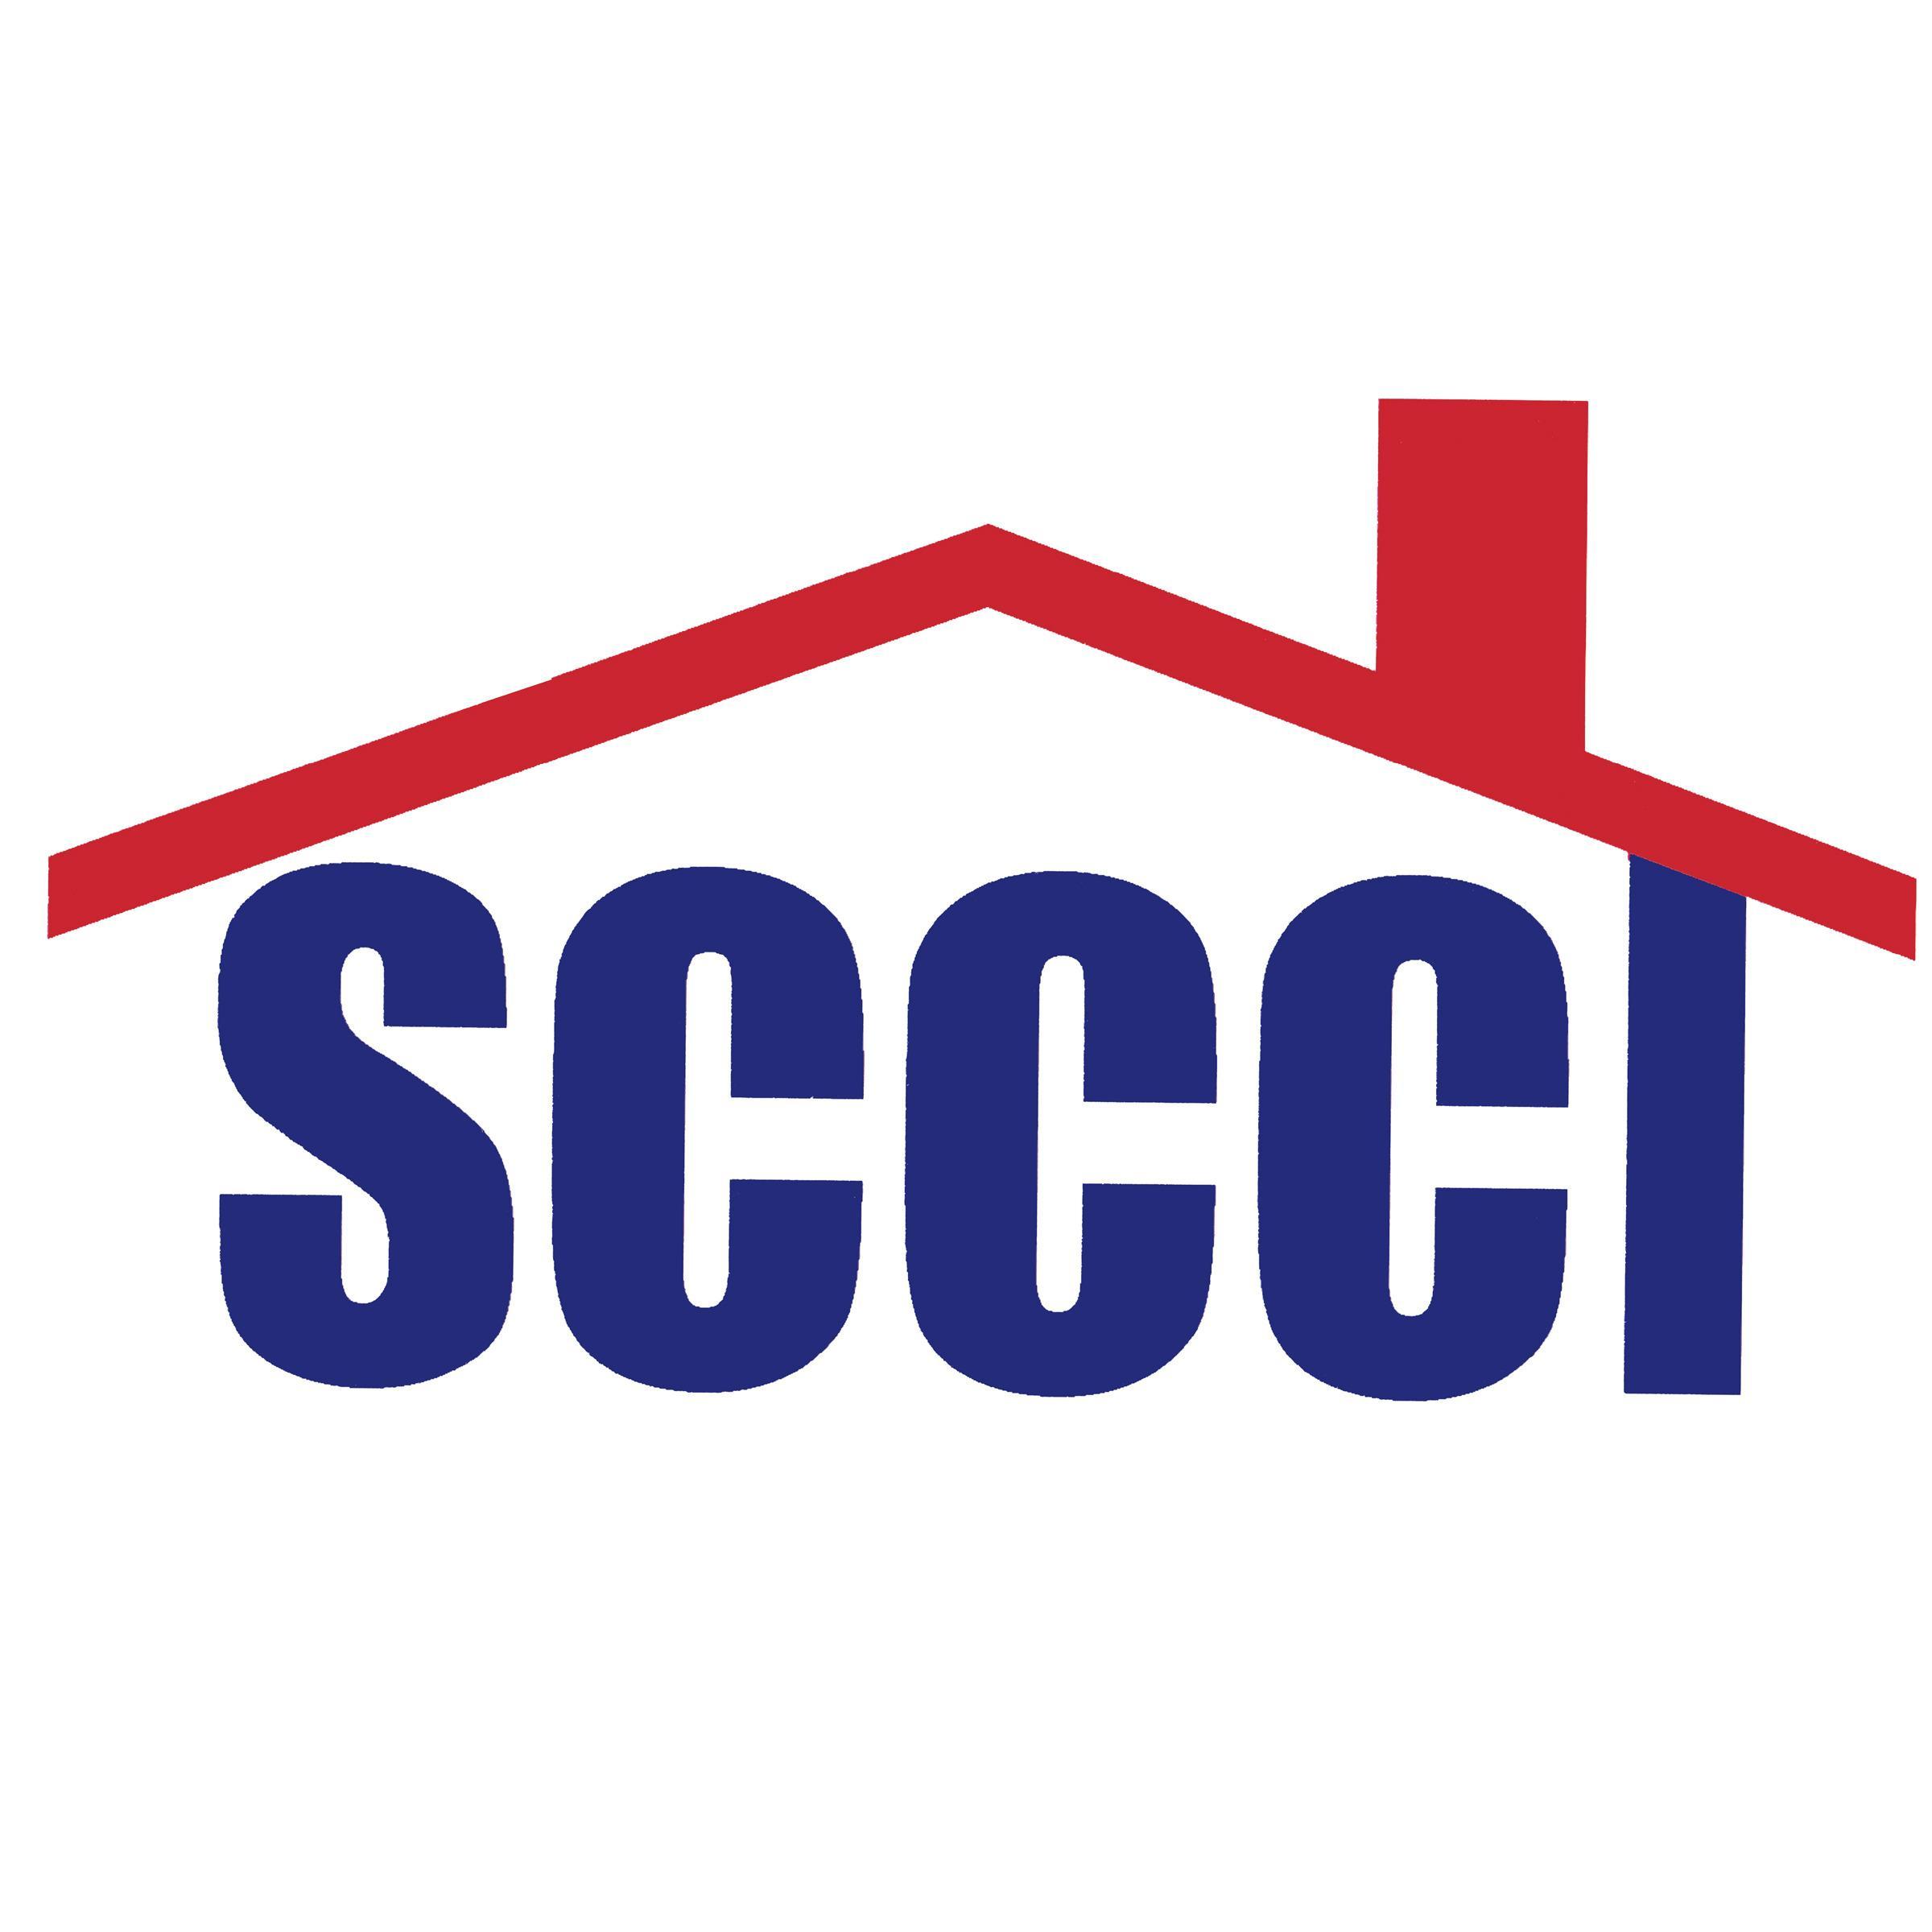 SCCCI - S CA Construction Consultants, Inc.